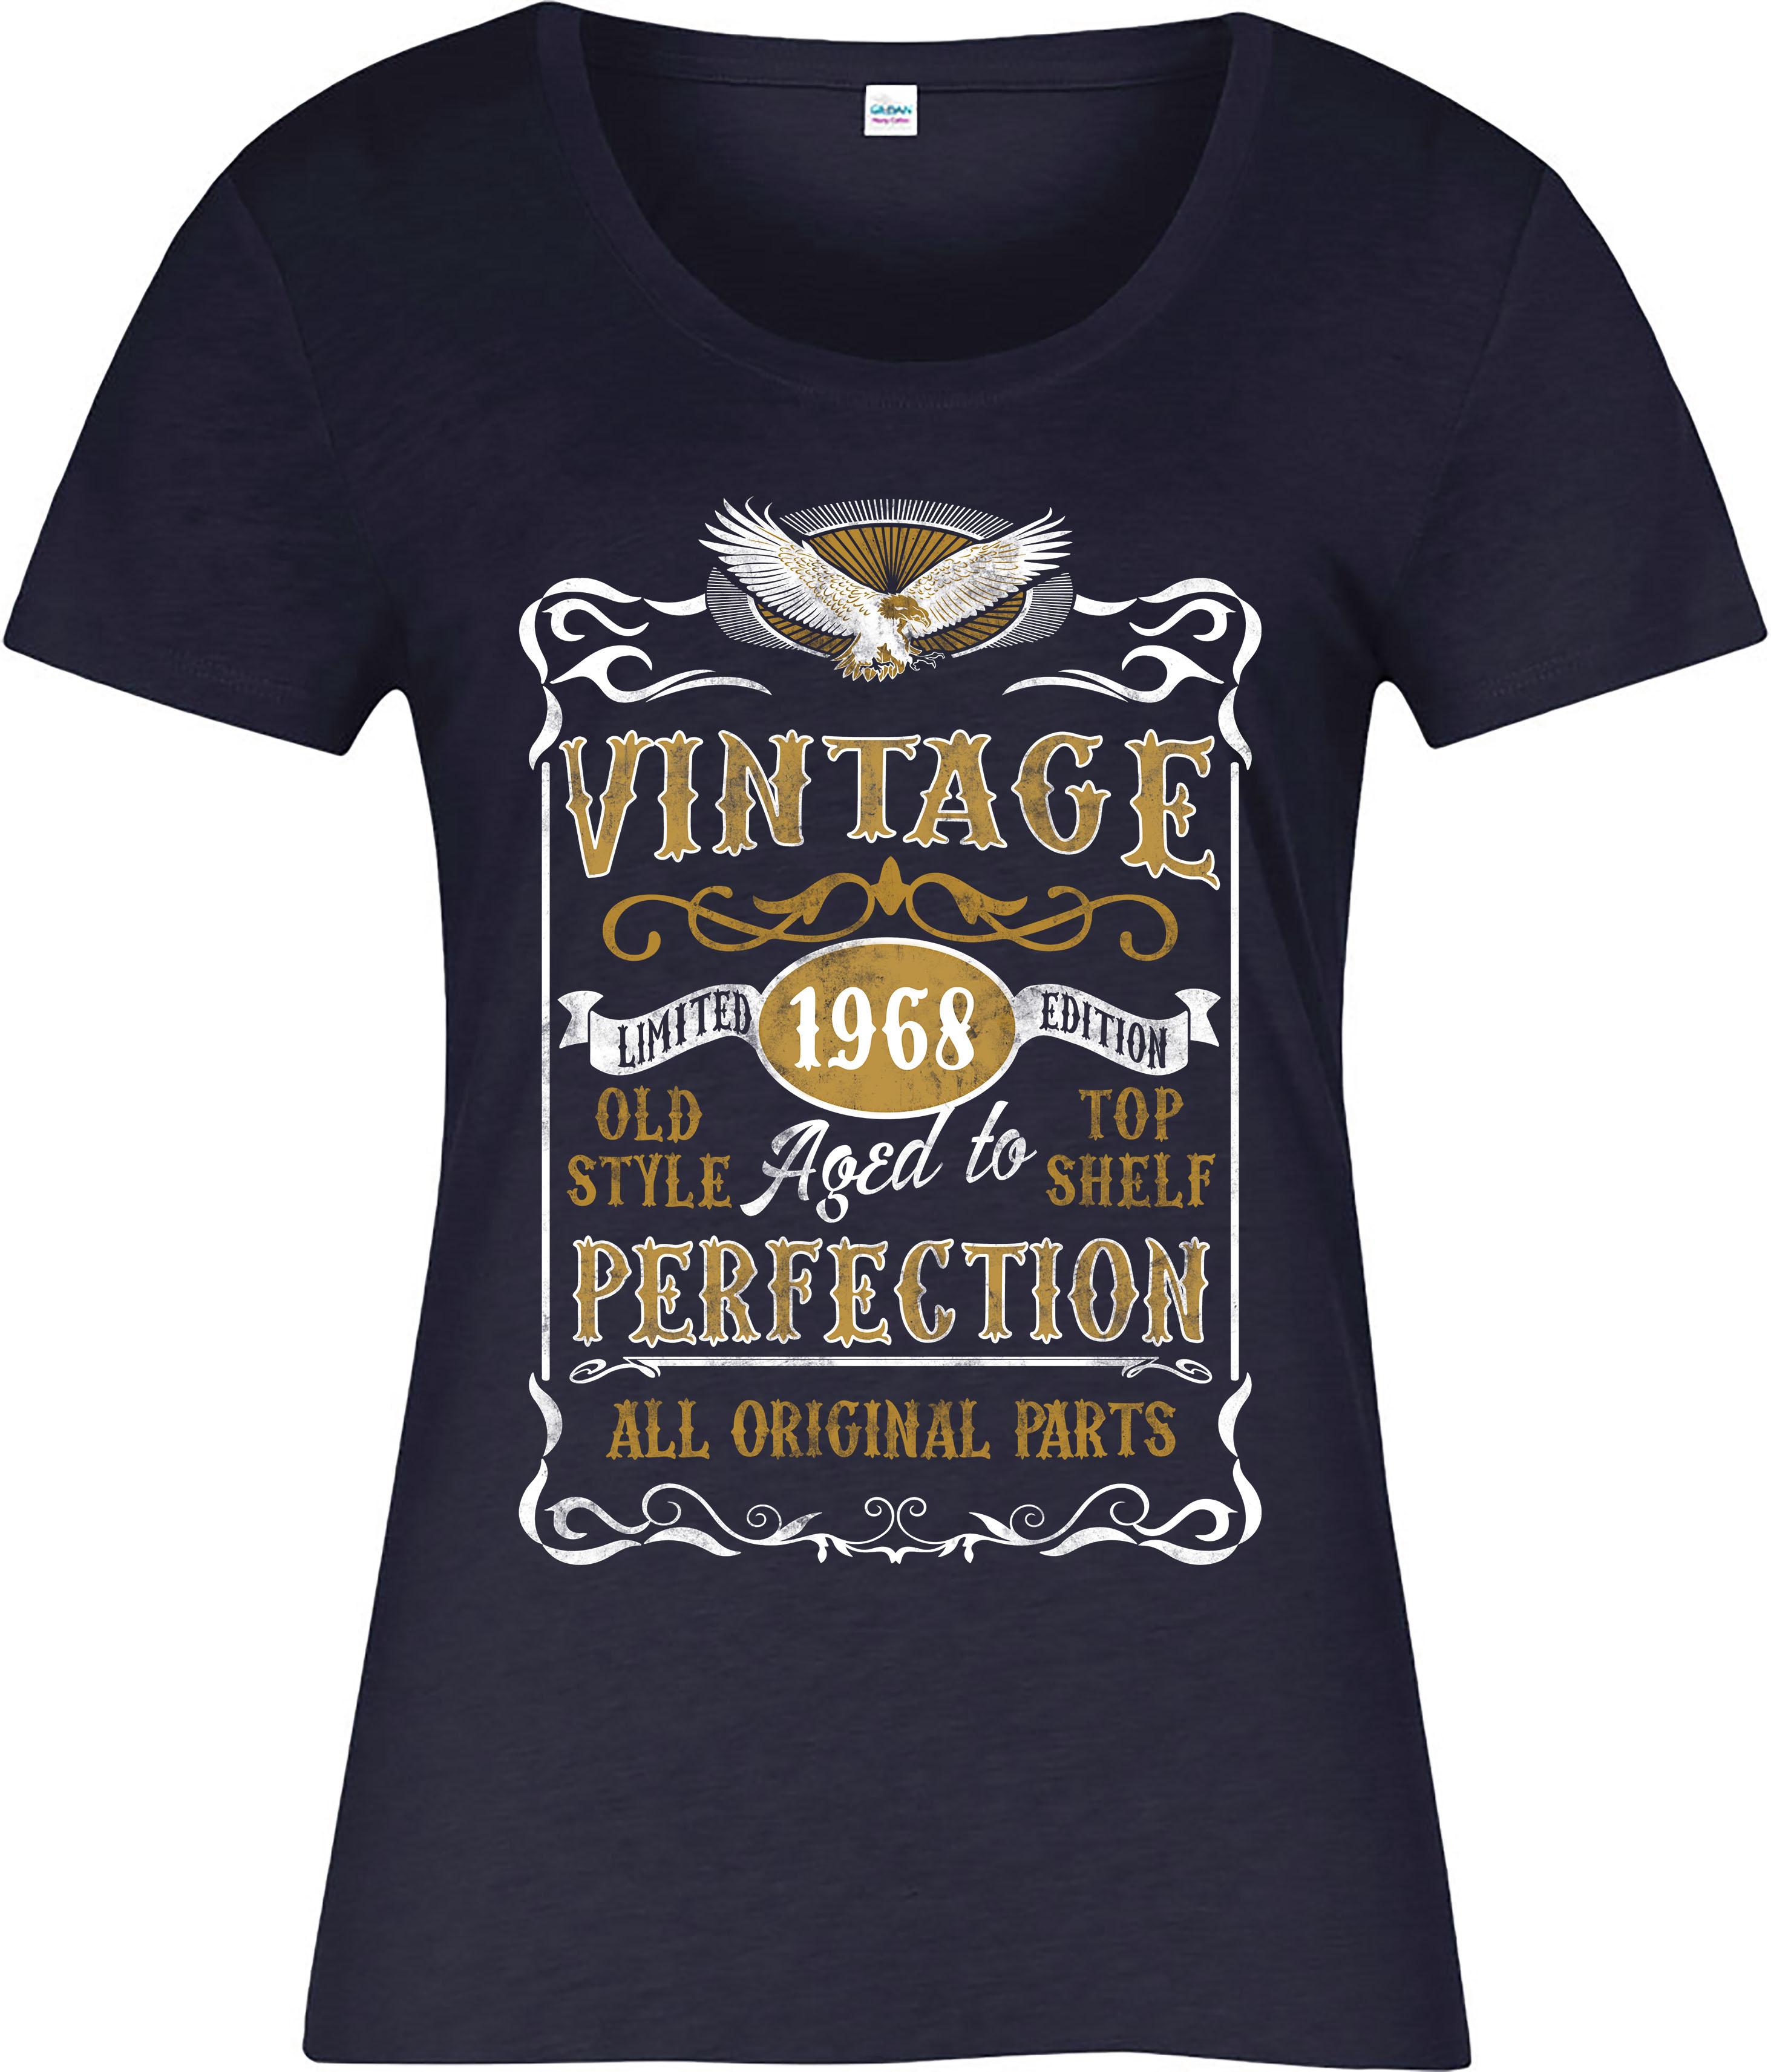 Made in 1968 Vintage Ladies T-Shirt, Born 1968 Birthday ...